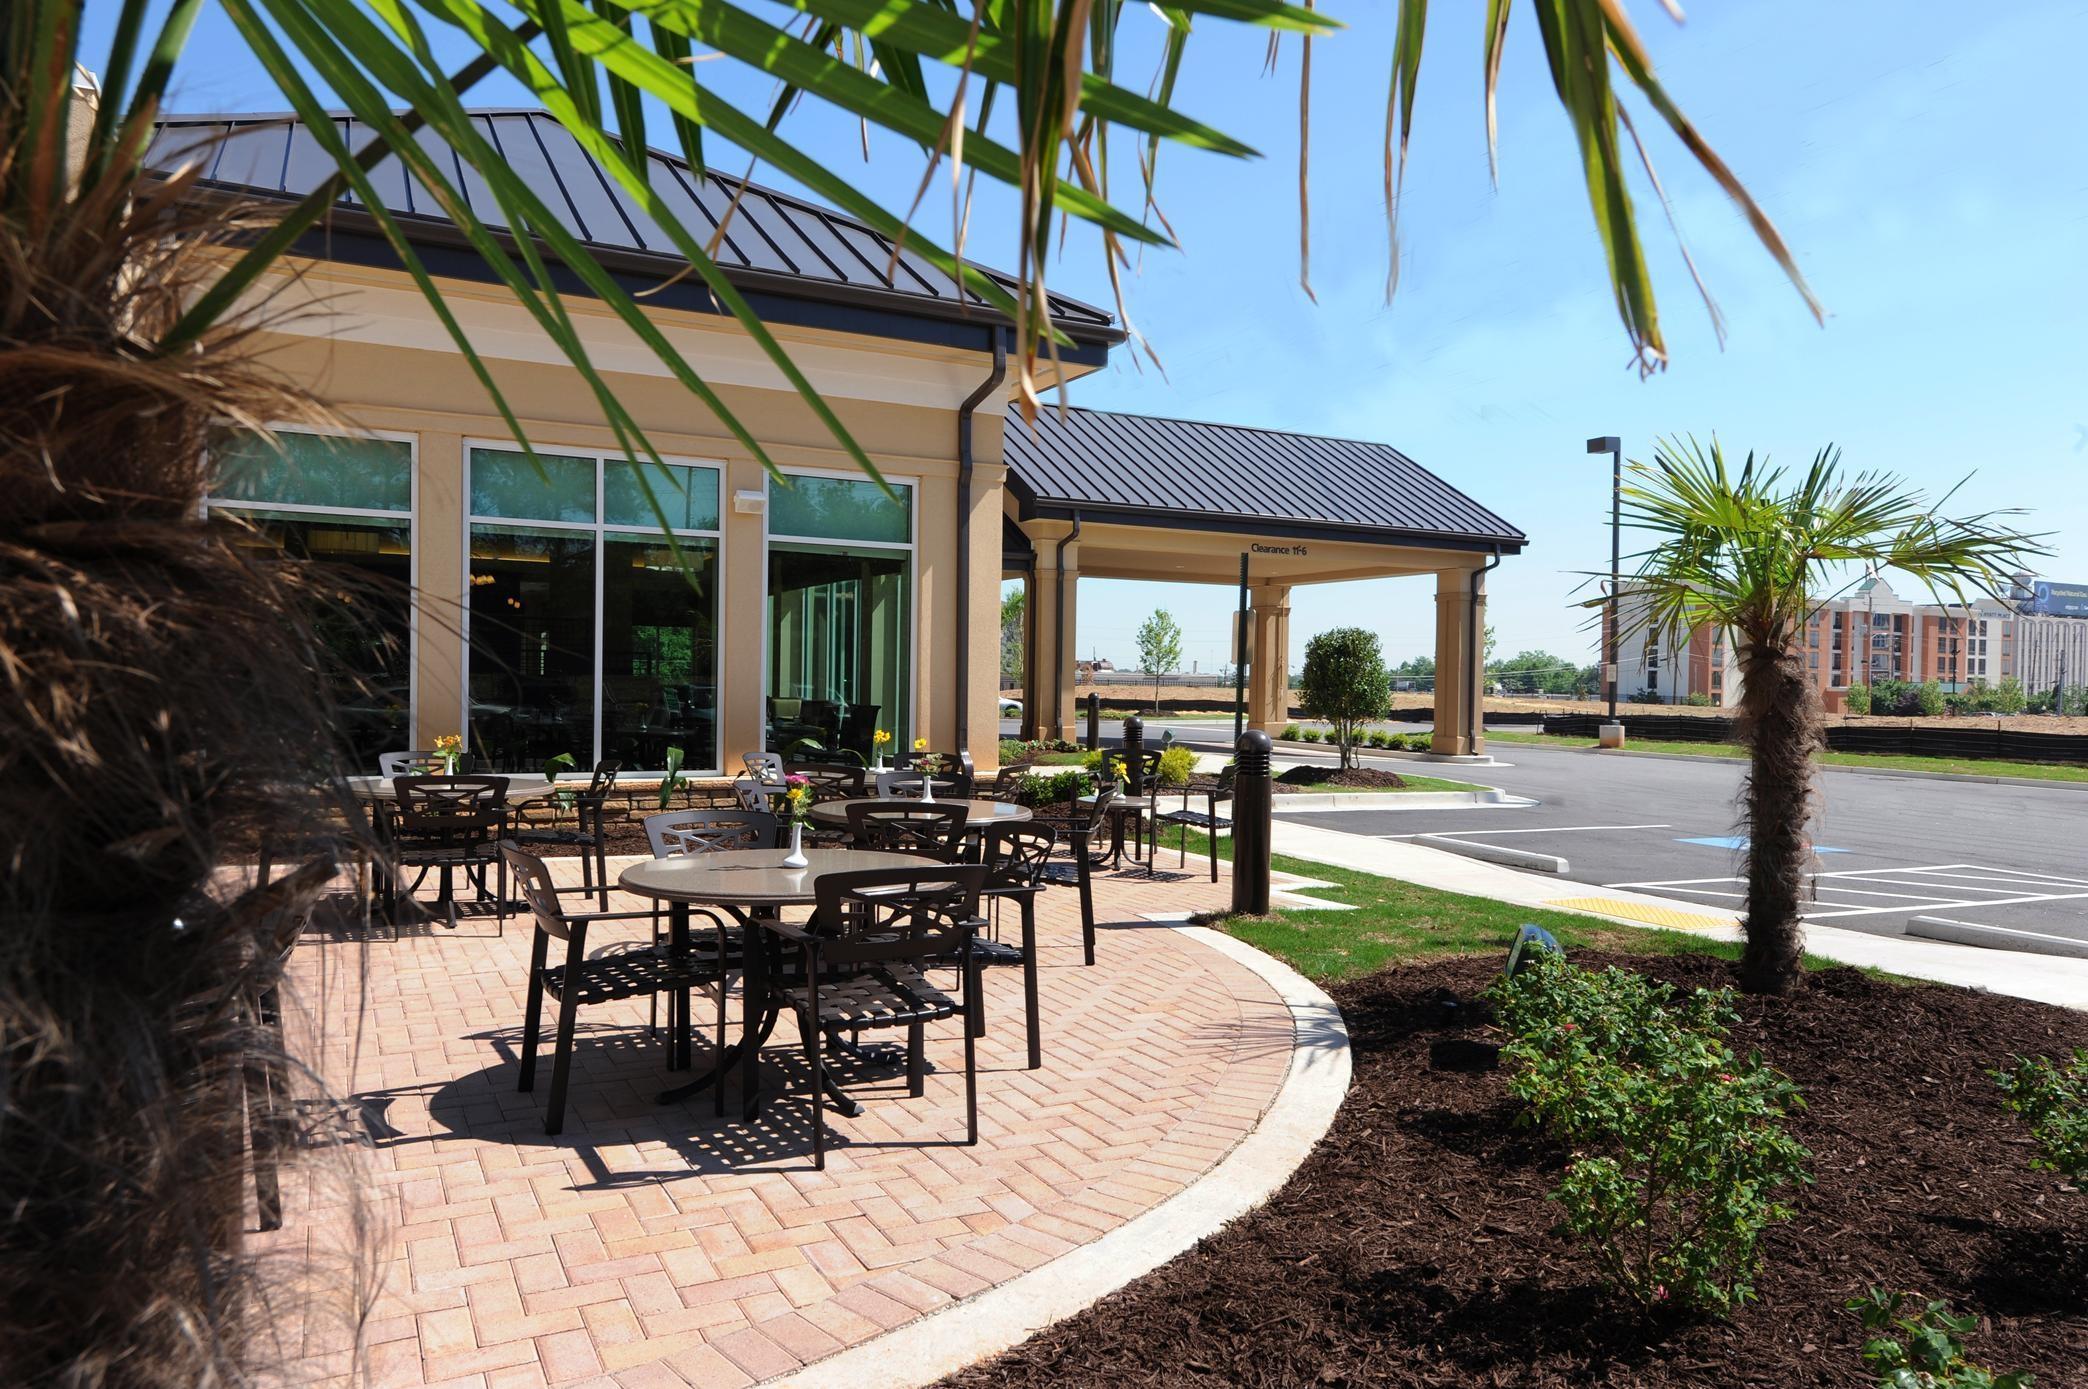 Hilton Garden Inn Atlanta Airport North image 28